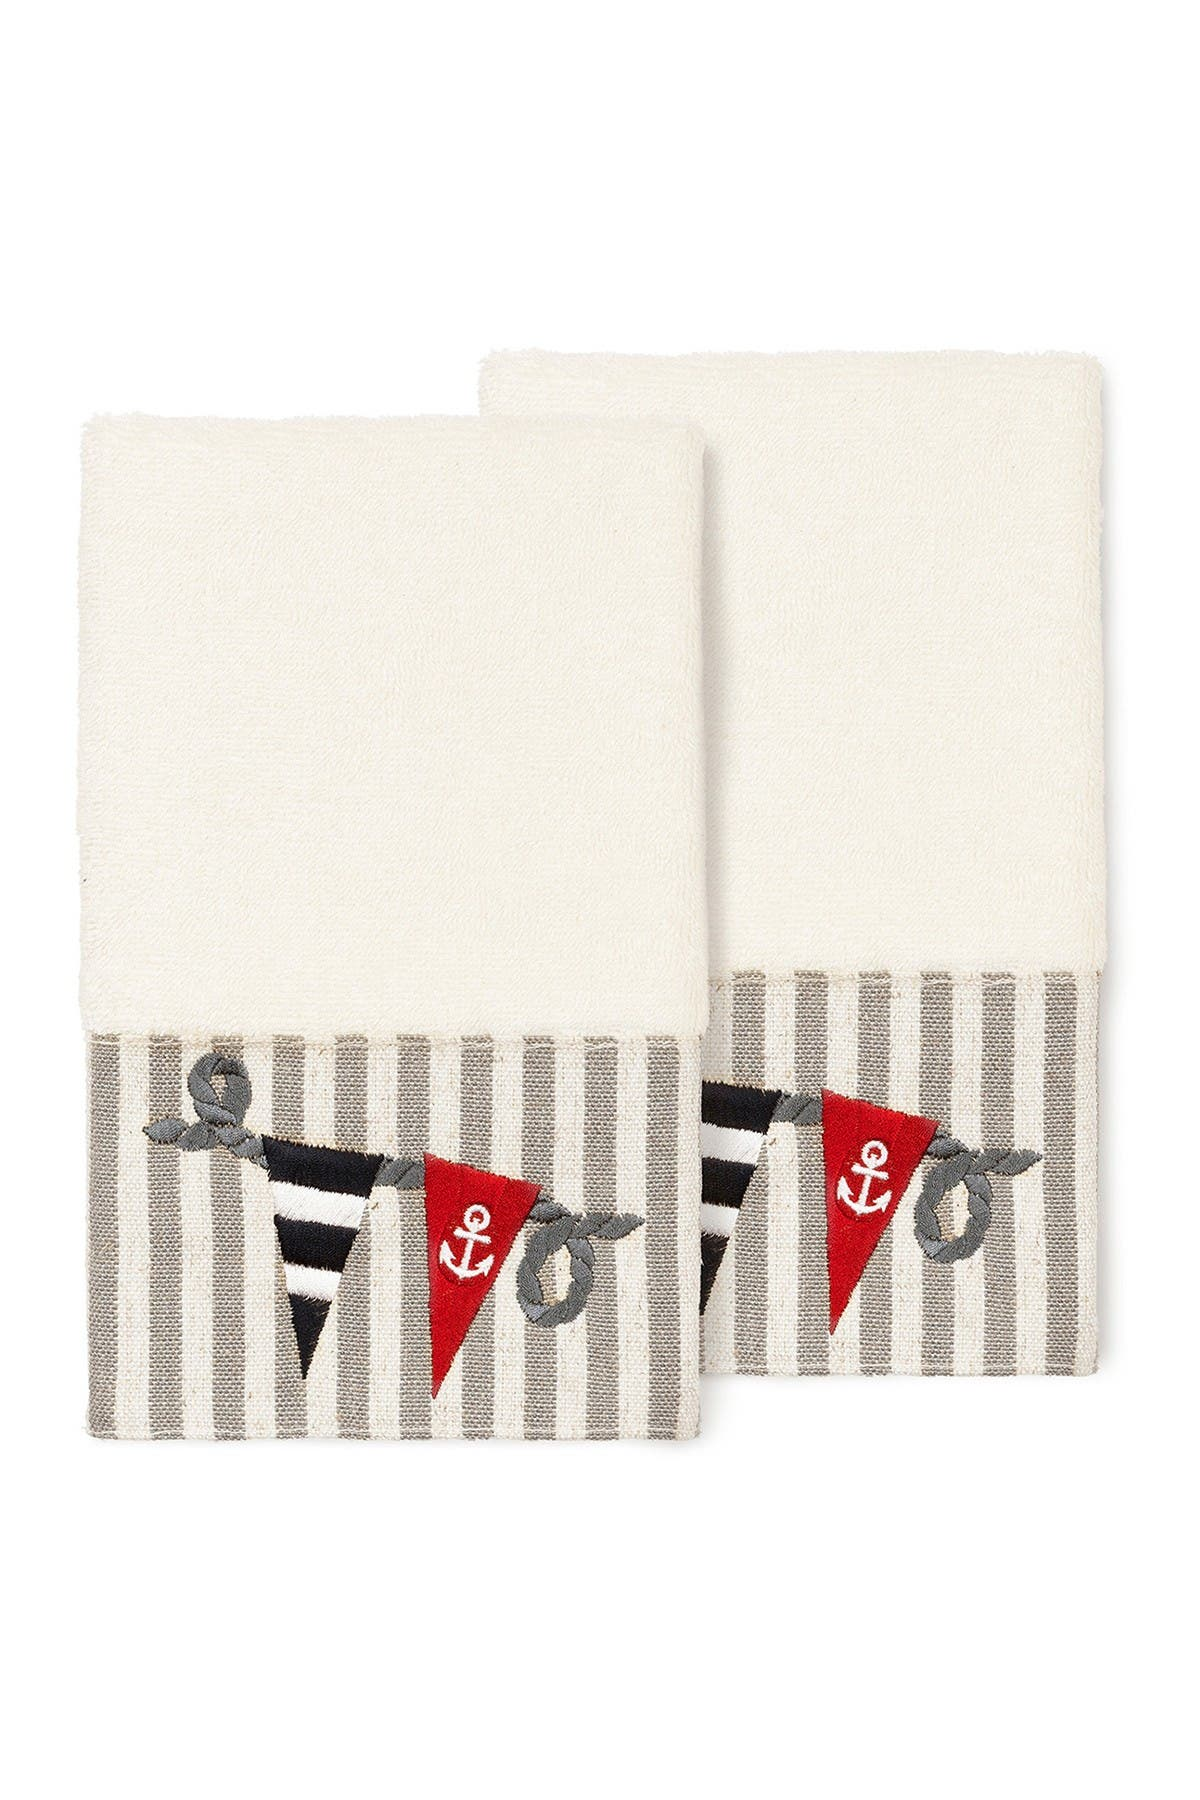 Image of LINUM HOME Ethan Embellished Hand Towel - Set of 2 - Cream